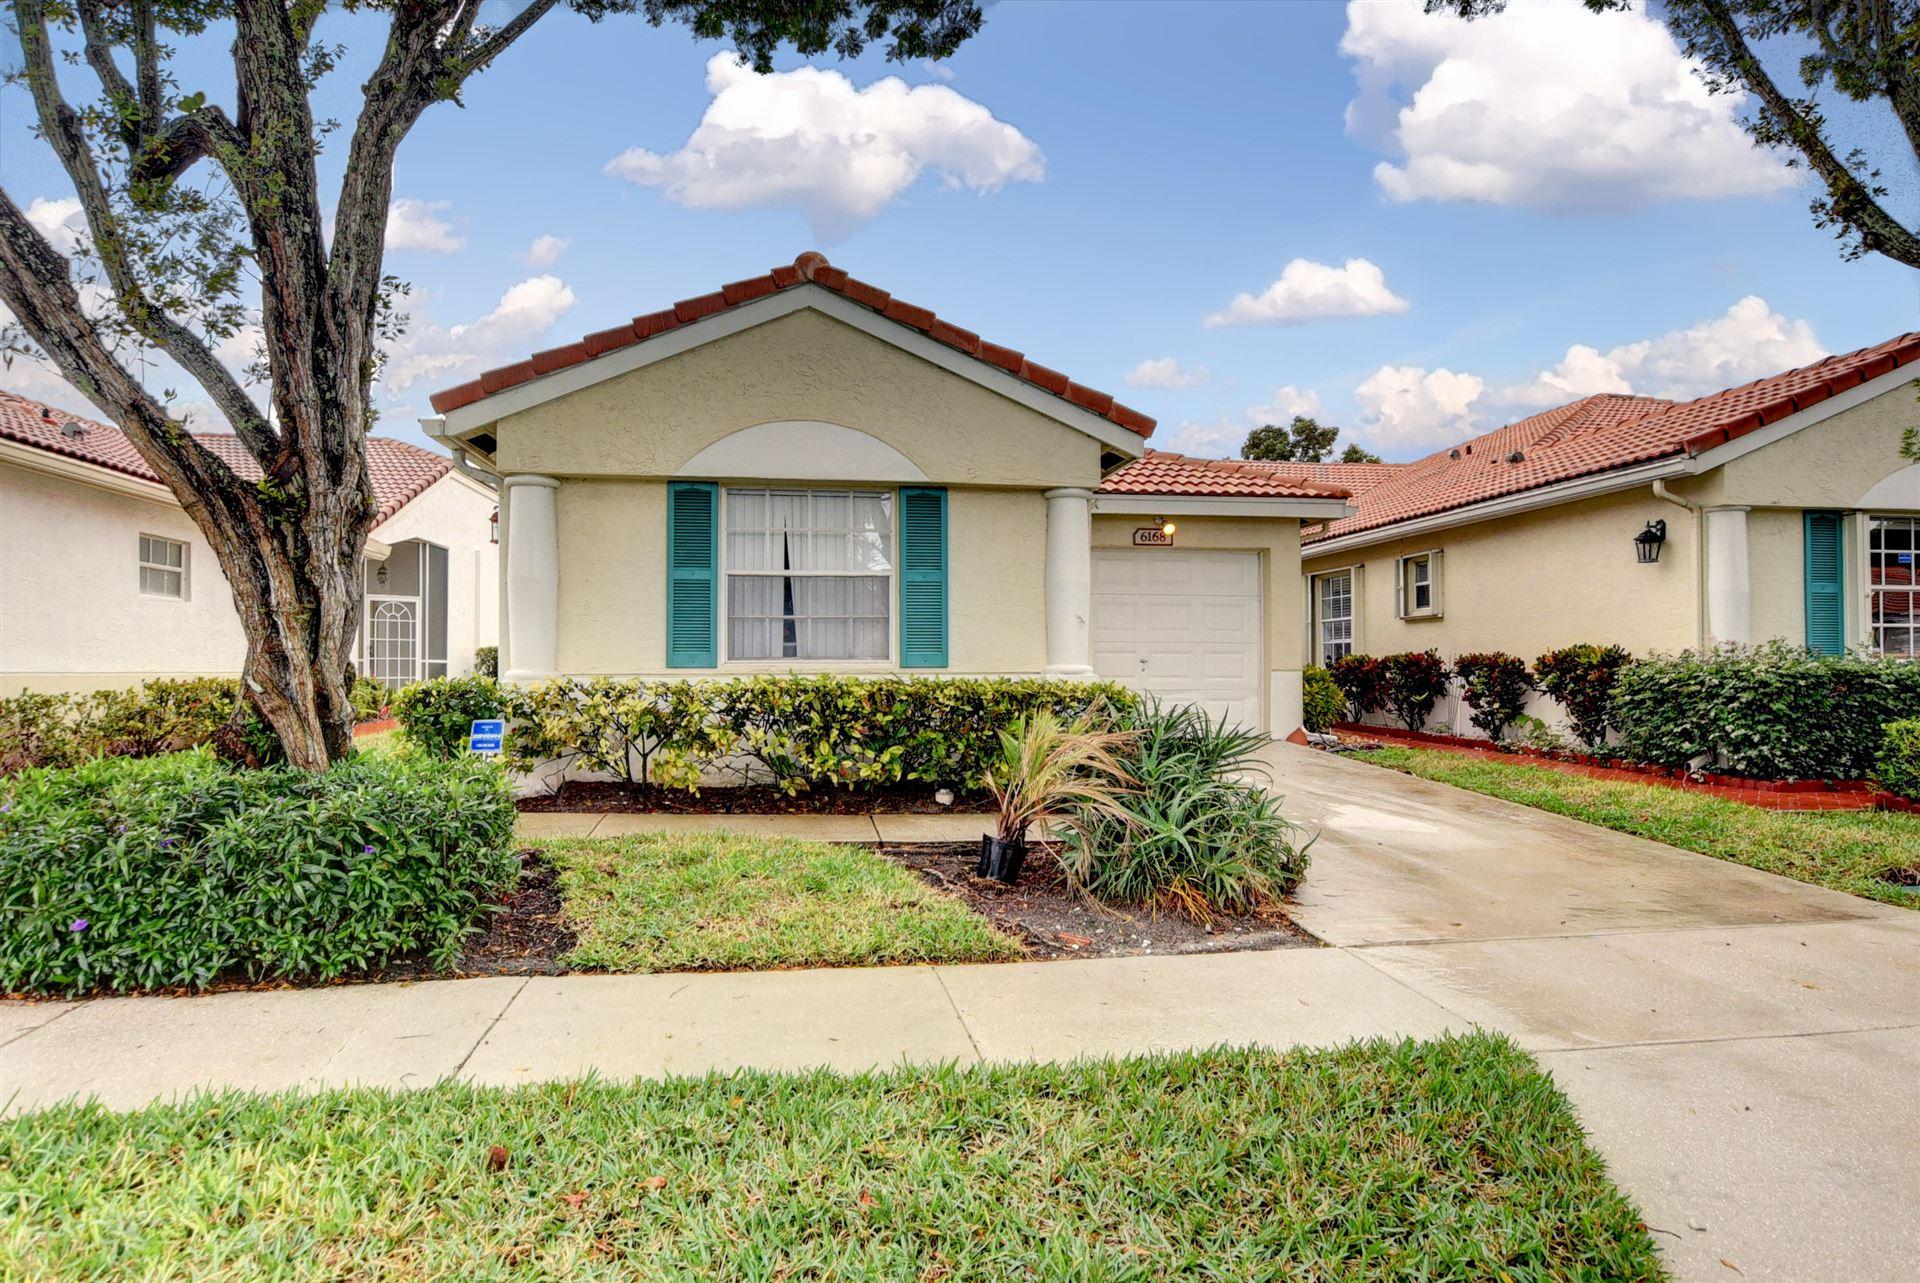 6168 Floral Lakes Drive, Delray Beach, FL 33484 - MLS#: RX-10601784